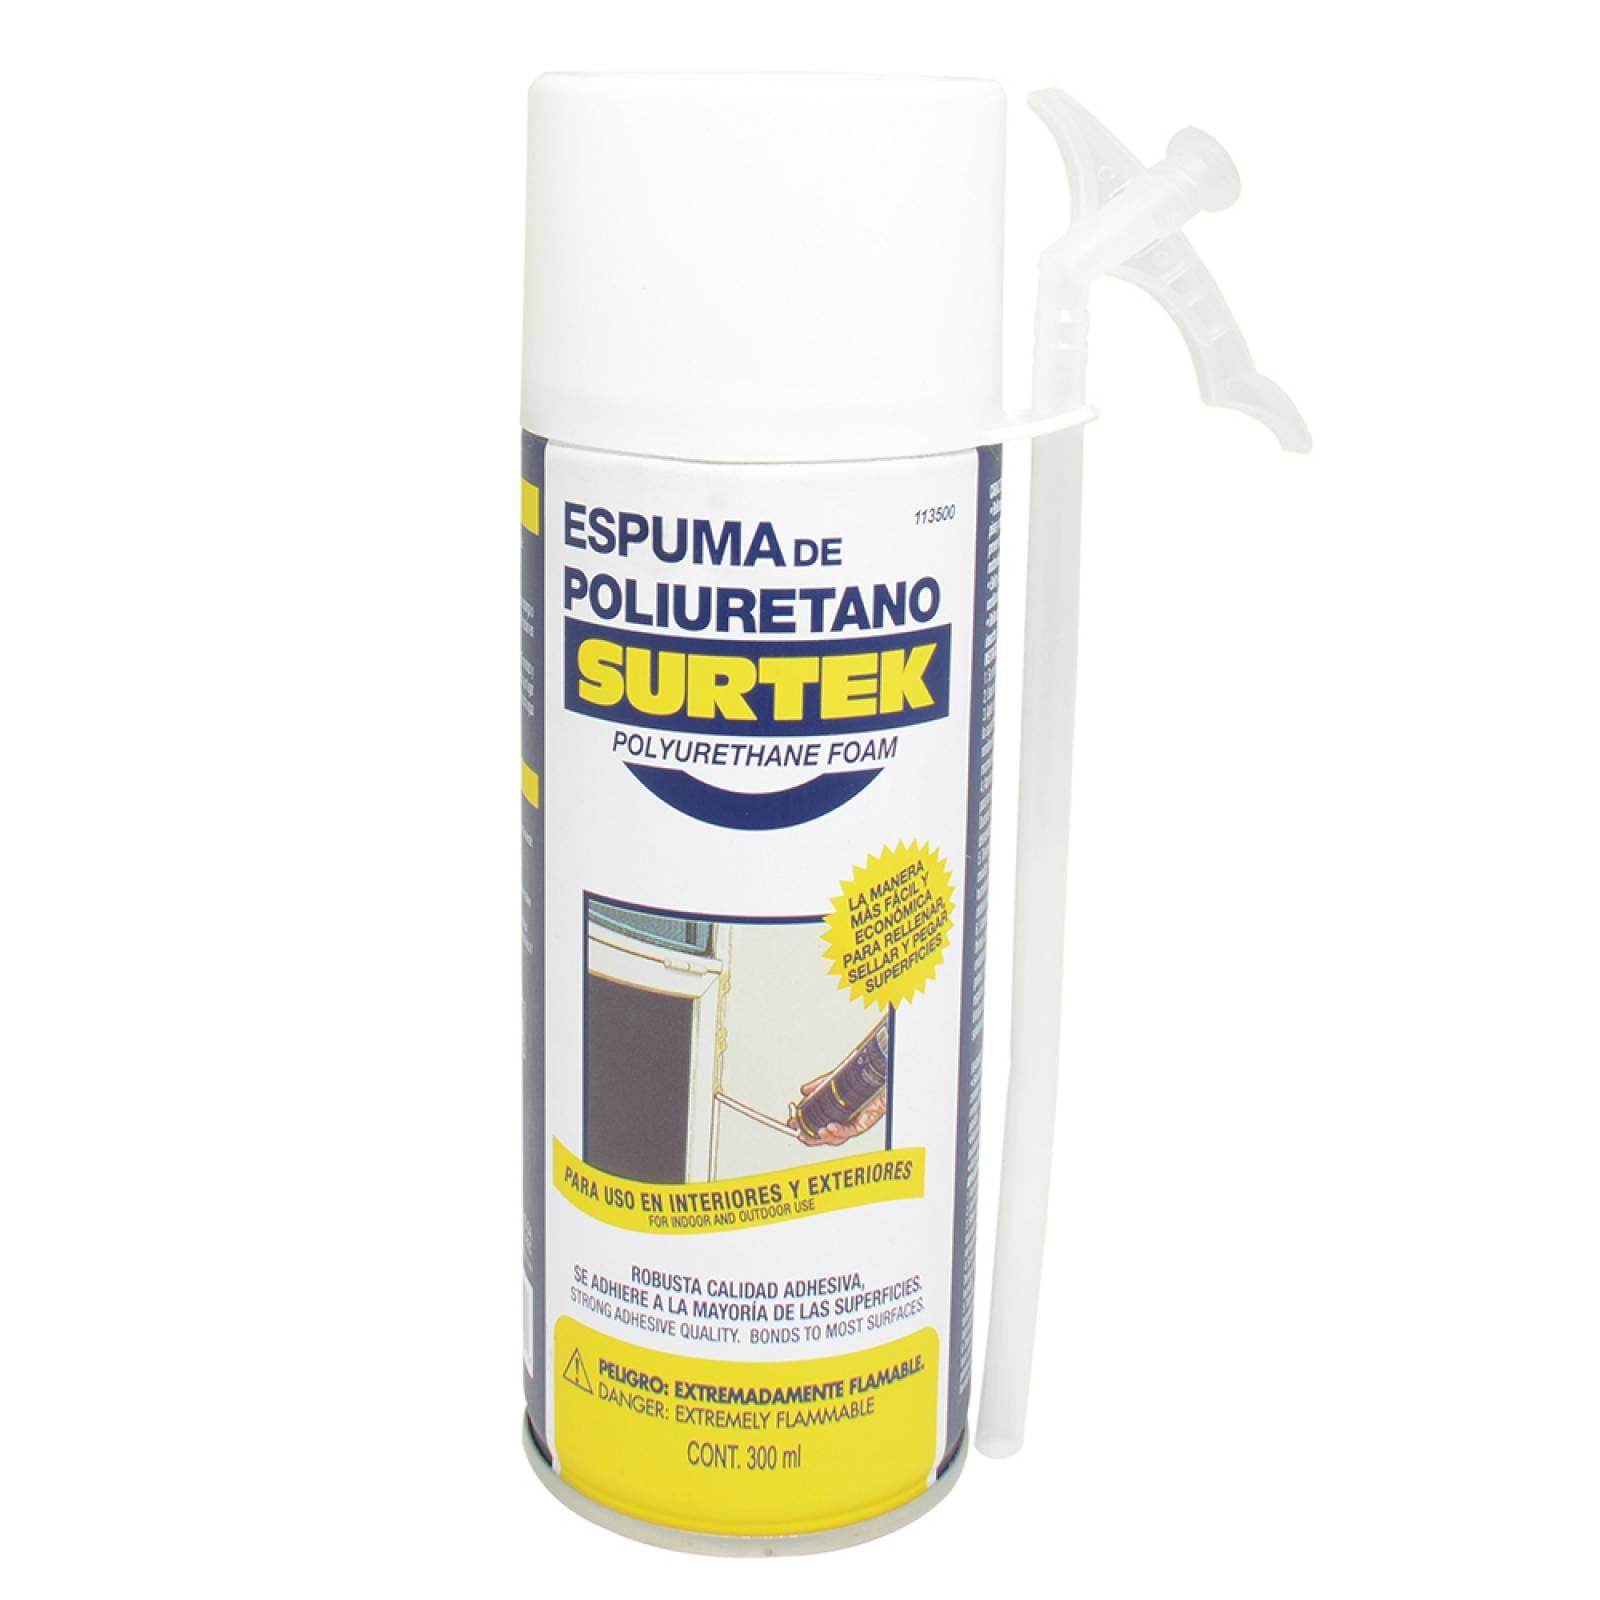 Espuma de poliuretano uso industrial 300 ml 113500 Surtek